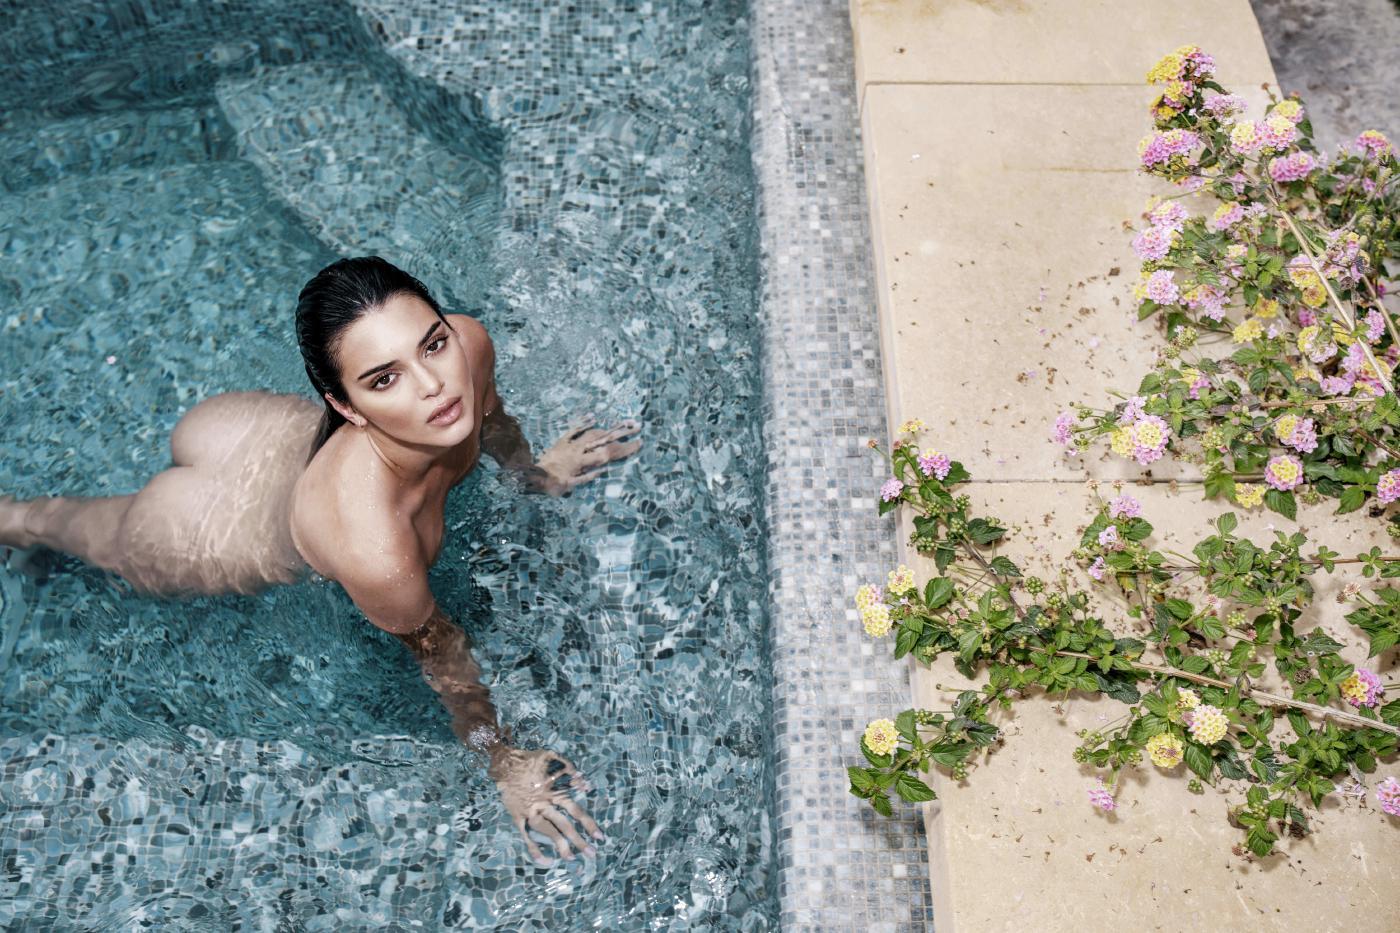 Kendall Jenner Nude Magazine Photoshoot Leaked Kioztc